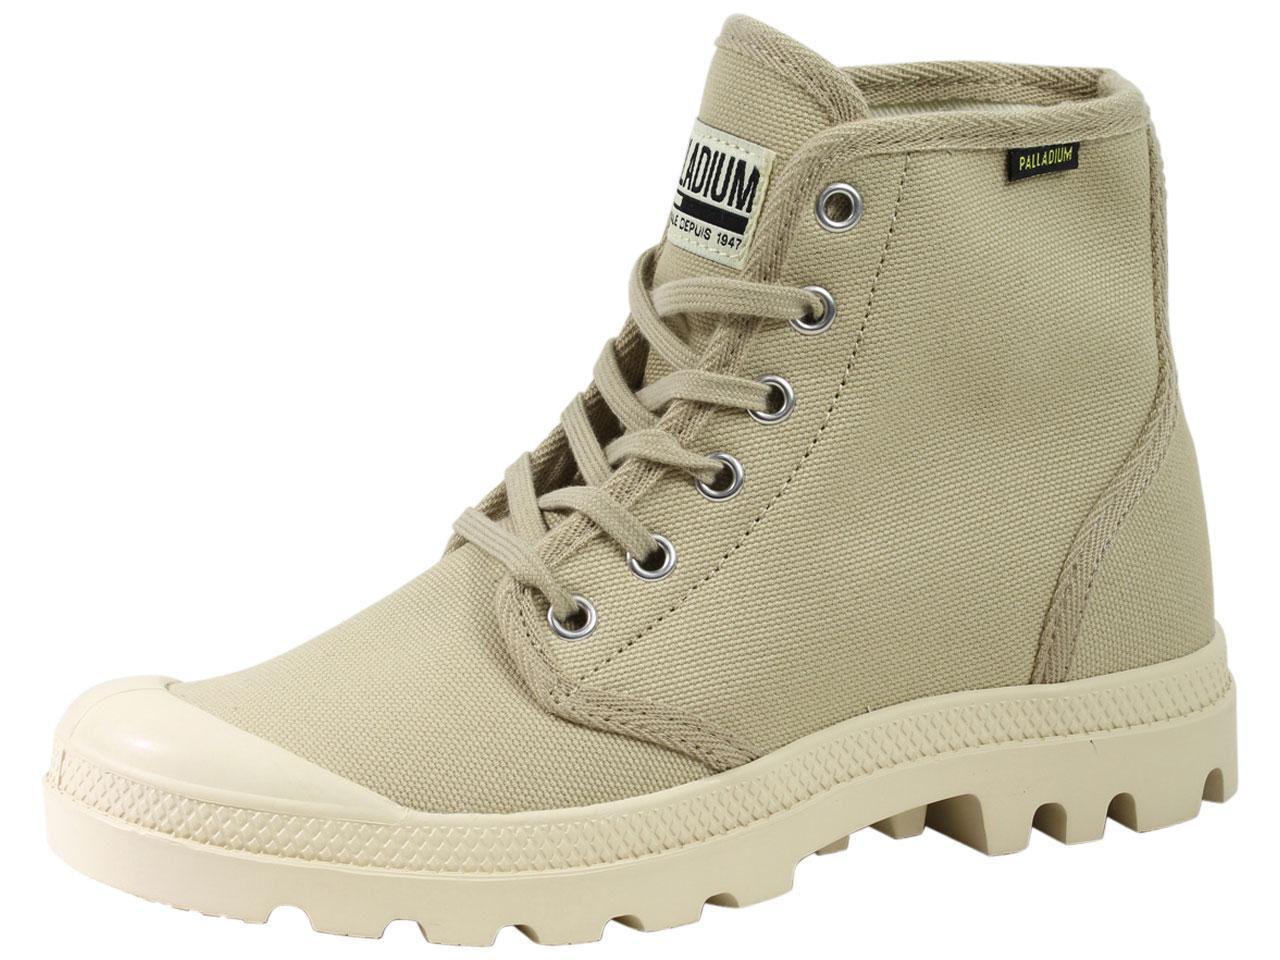 Image of Palladium Men's Pampa Hi Originale Chukka Boots Shoes - Beige - 4.5 D(M) US/6 B(M) US